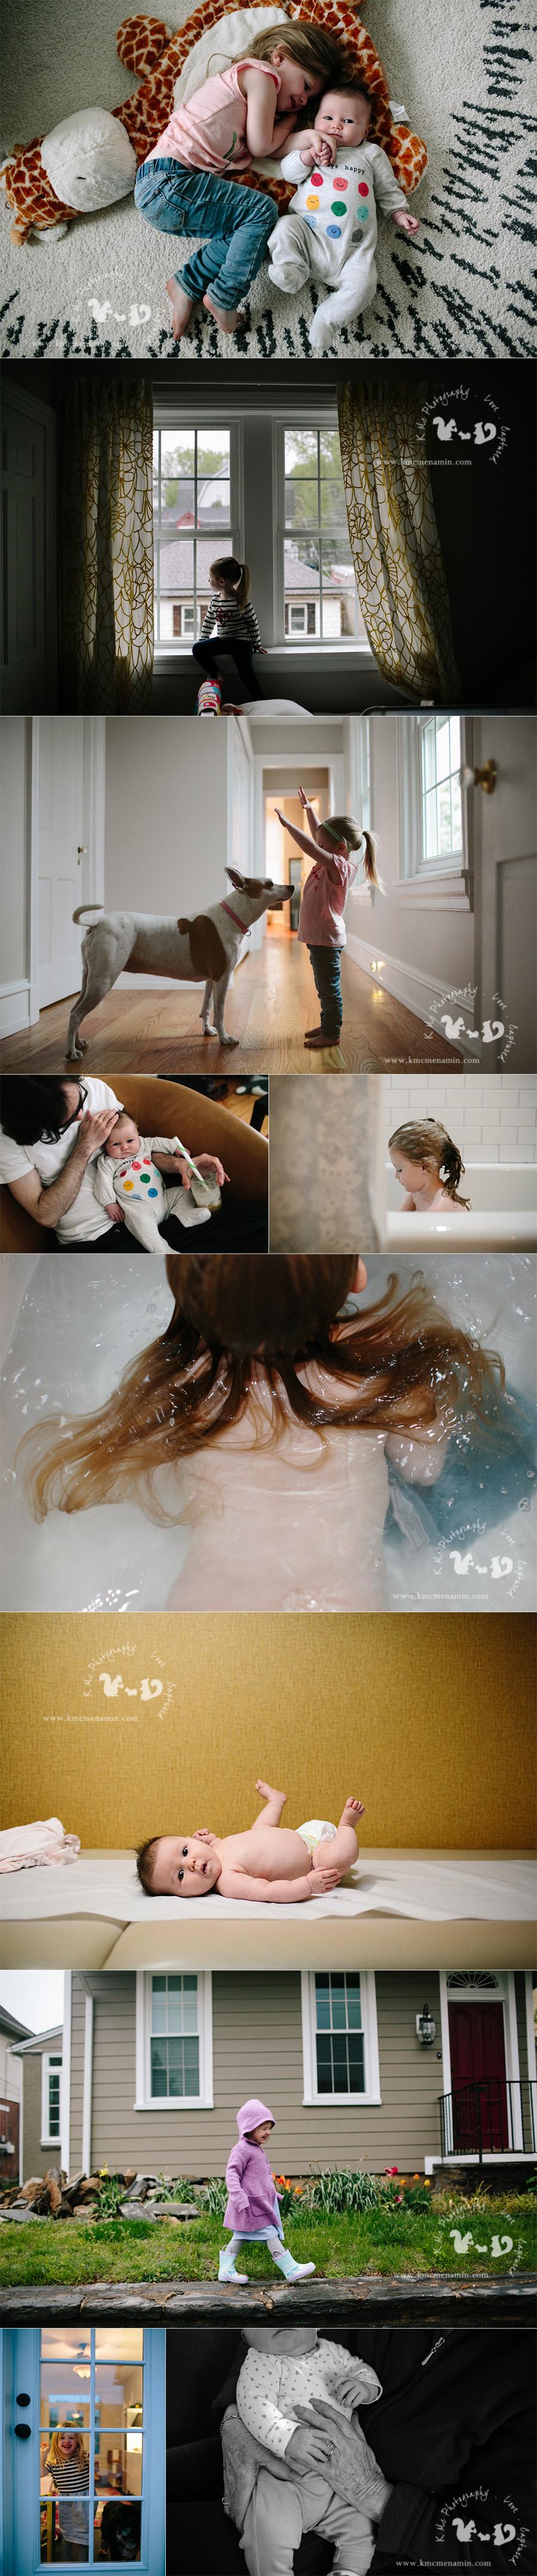 Conshohocken_Family_Photographer_11